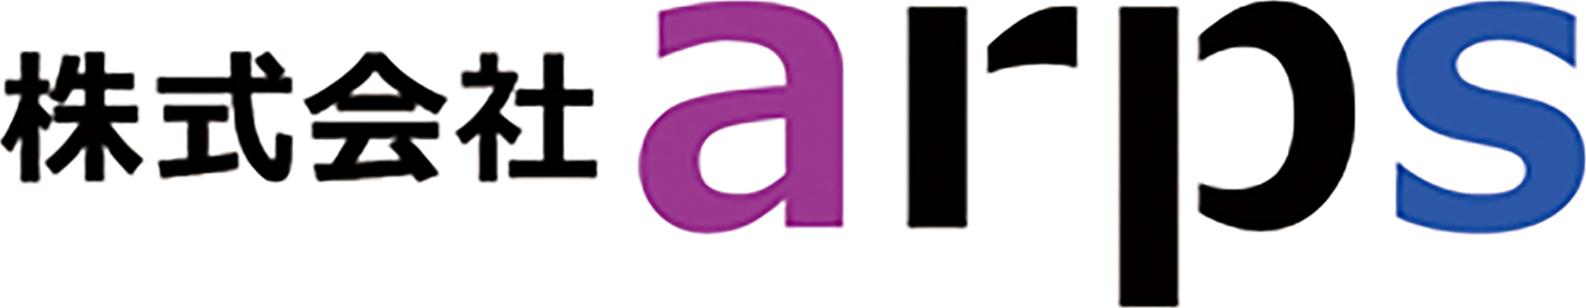 arps-logo-2